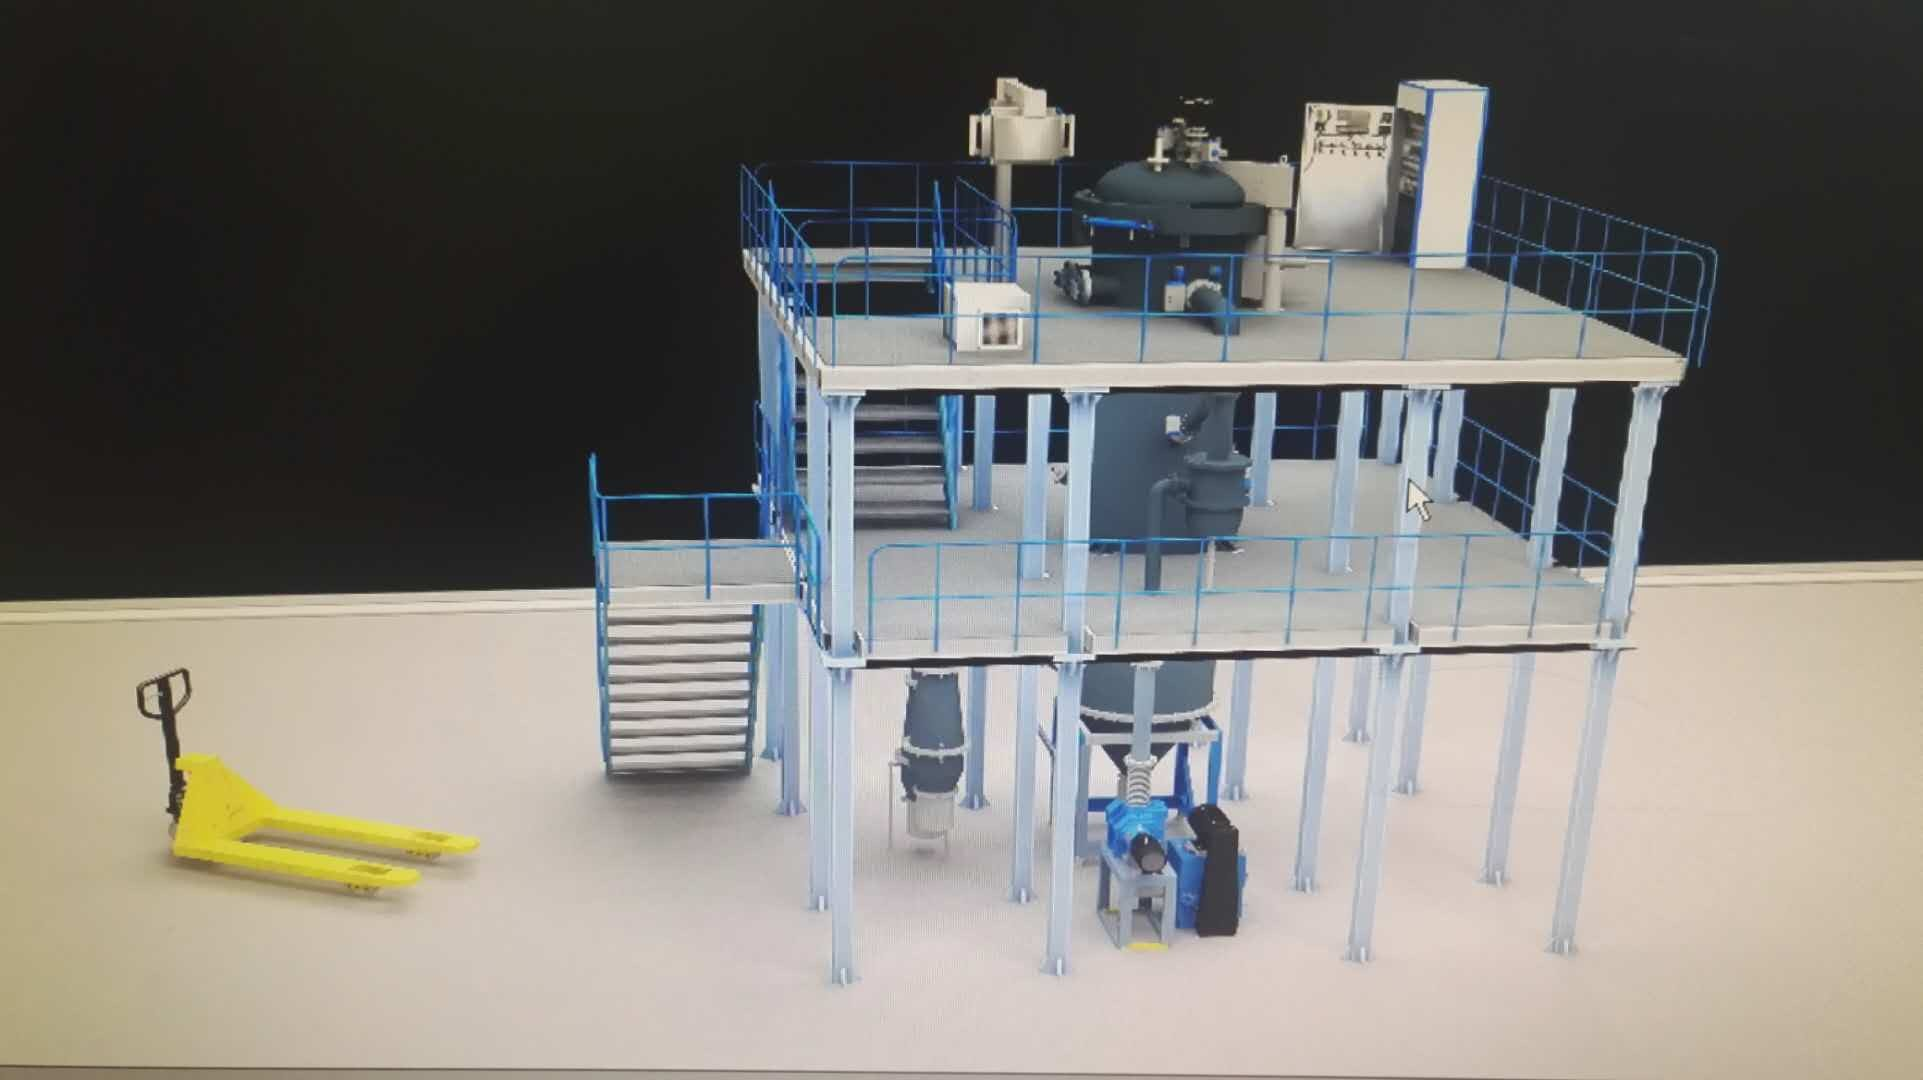 Vacuum Induction Powder Atomizing Furnace Manufacturers, Vacuum Induction Powder Atomizing Furnace Factory, Supply Vacuum Induction Powder Atomizing Furnace